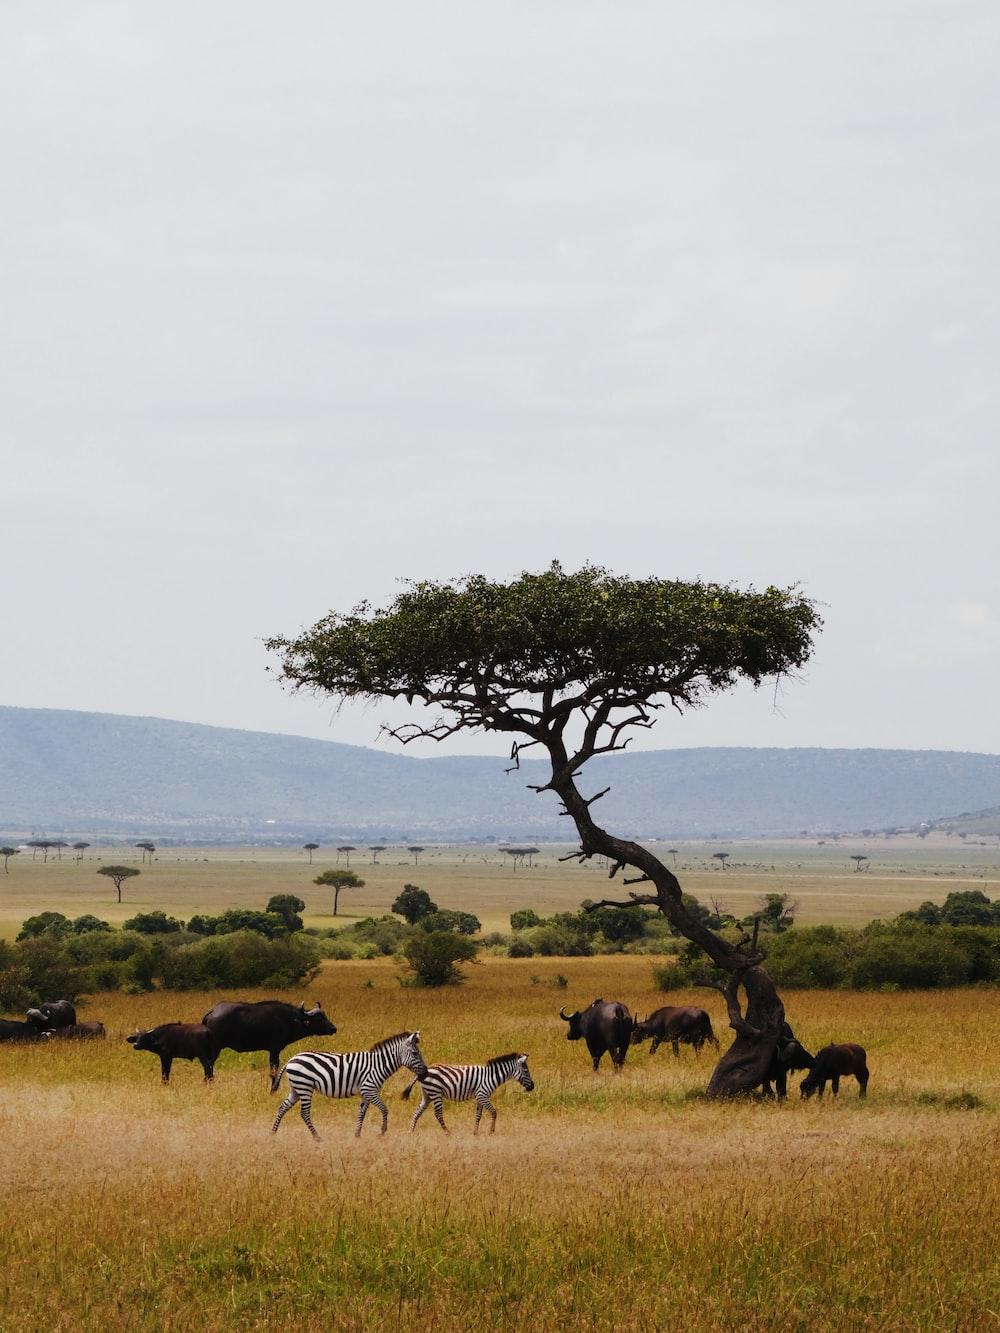 wild animals near tree